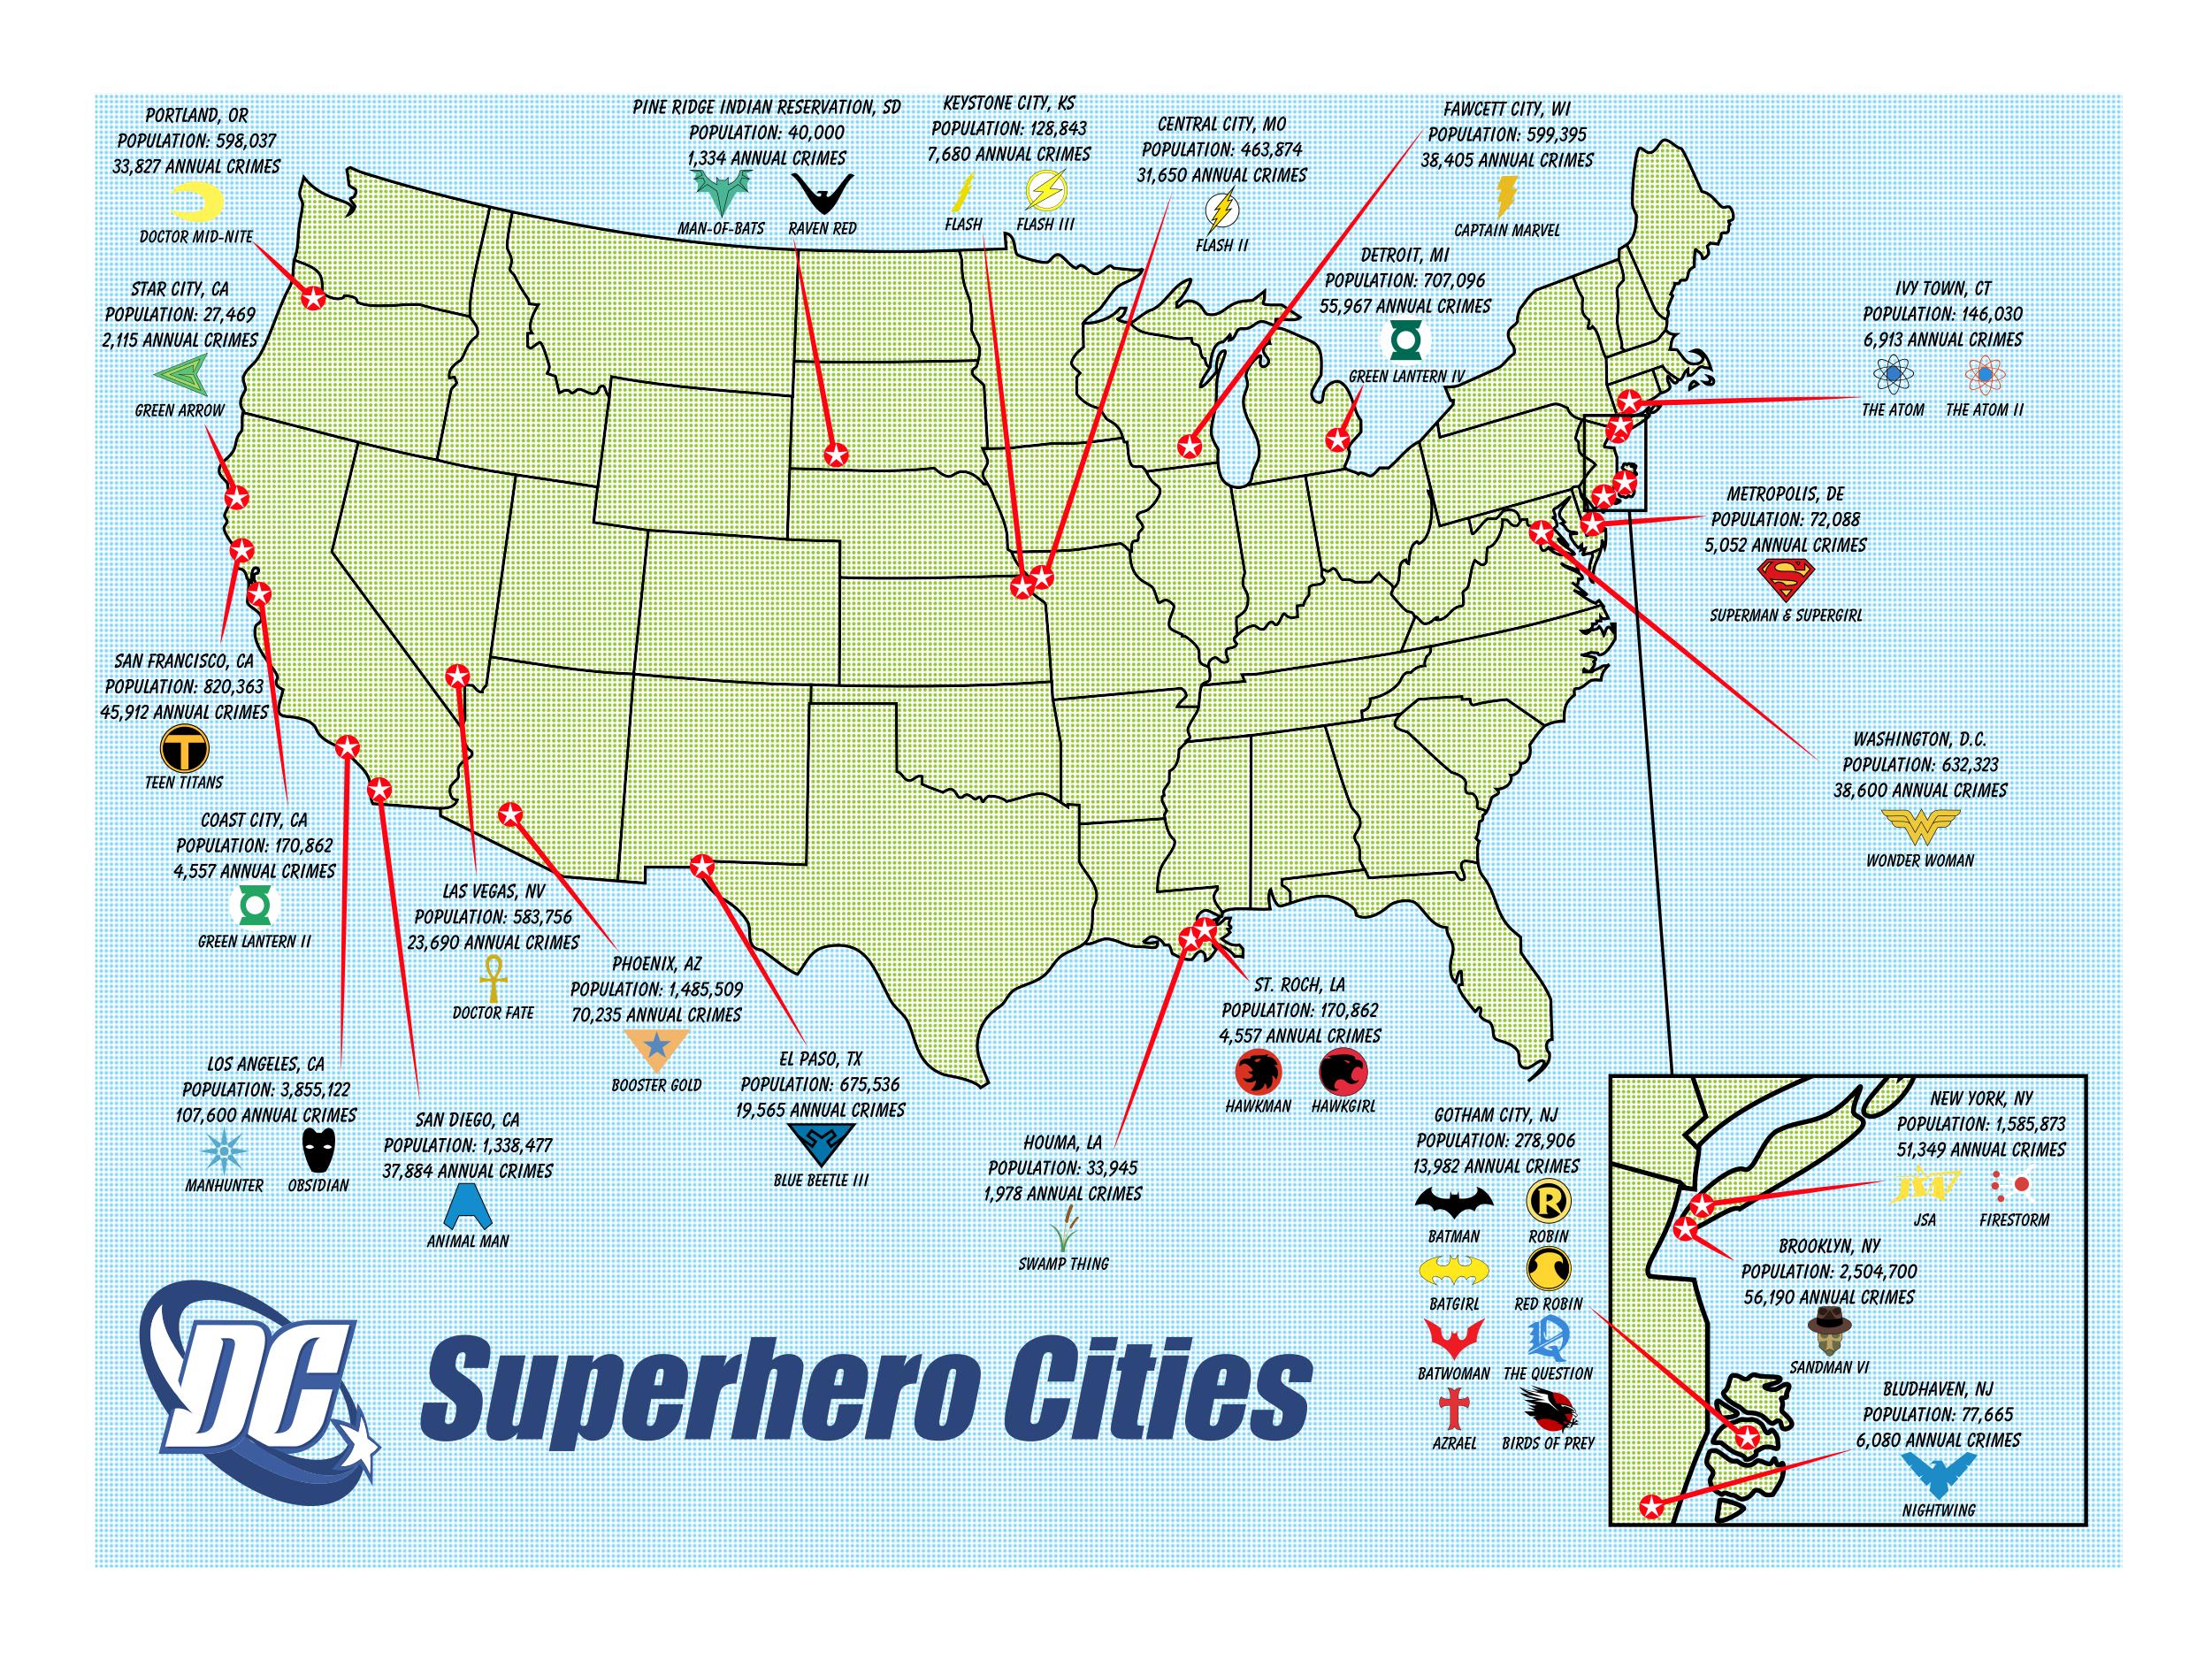 dc superhero cities by batmanbrony on deviantart